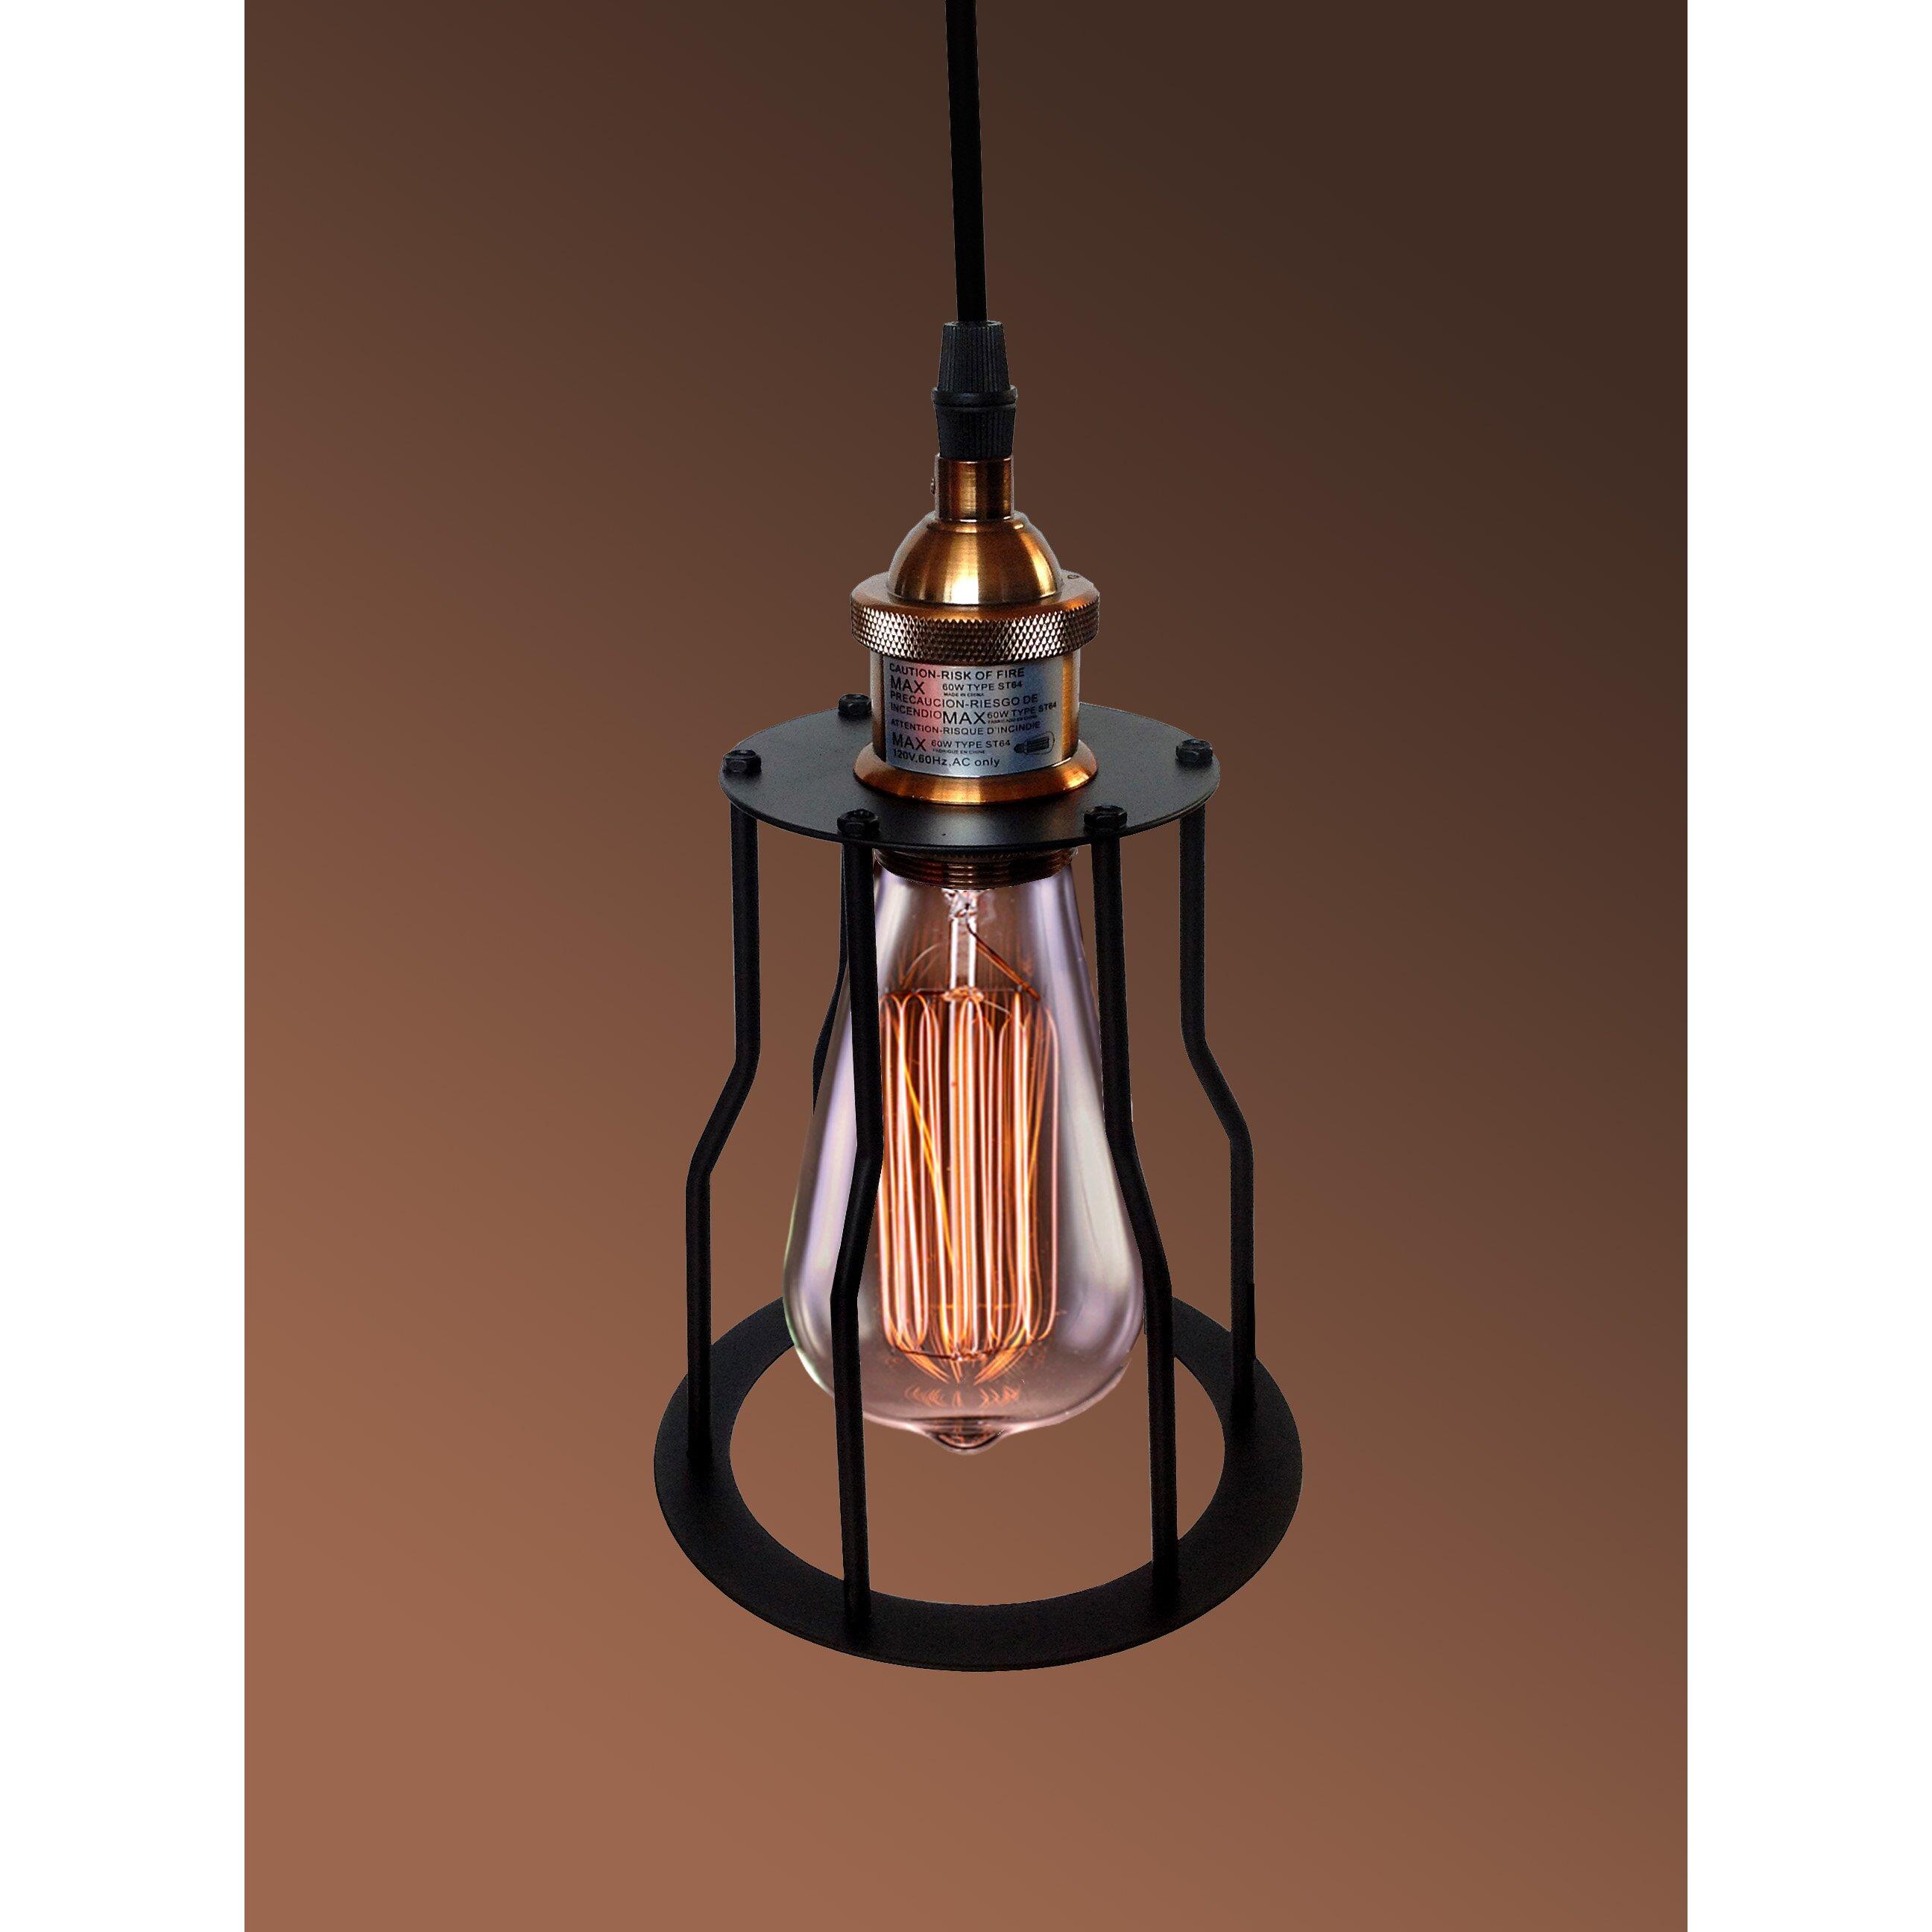 Height Adjustable Louisanne Pendant Light: Warehouse Of Tiffany Dinah Adjustable Height 1-Light Mini